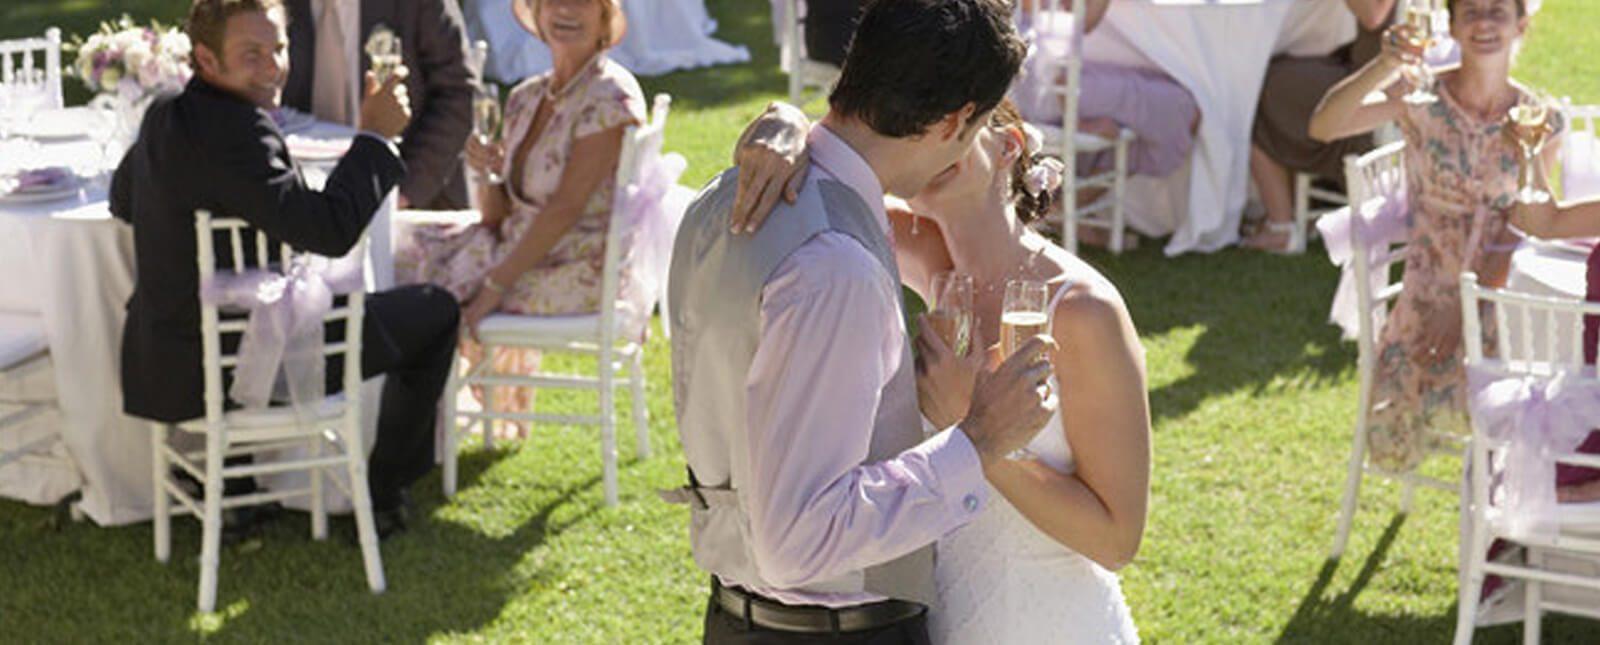 Dresscode Mallorca Hochzeit